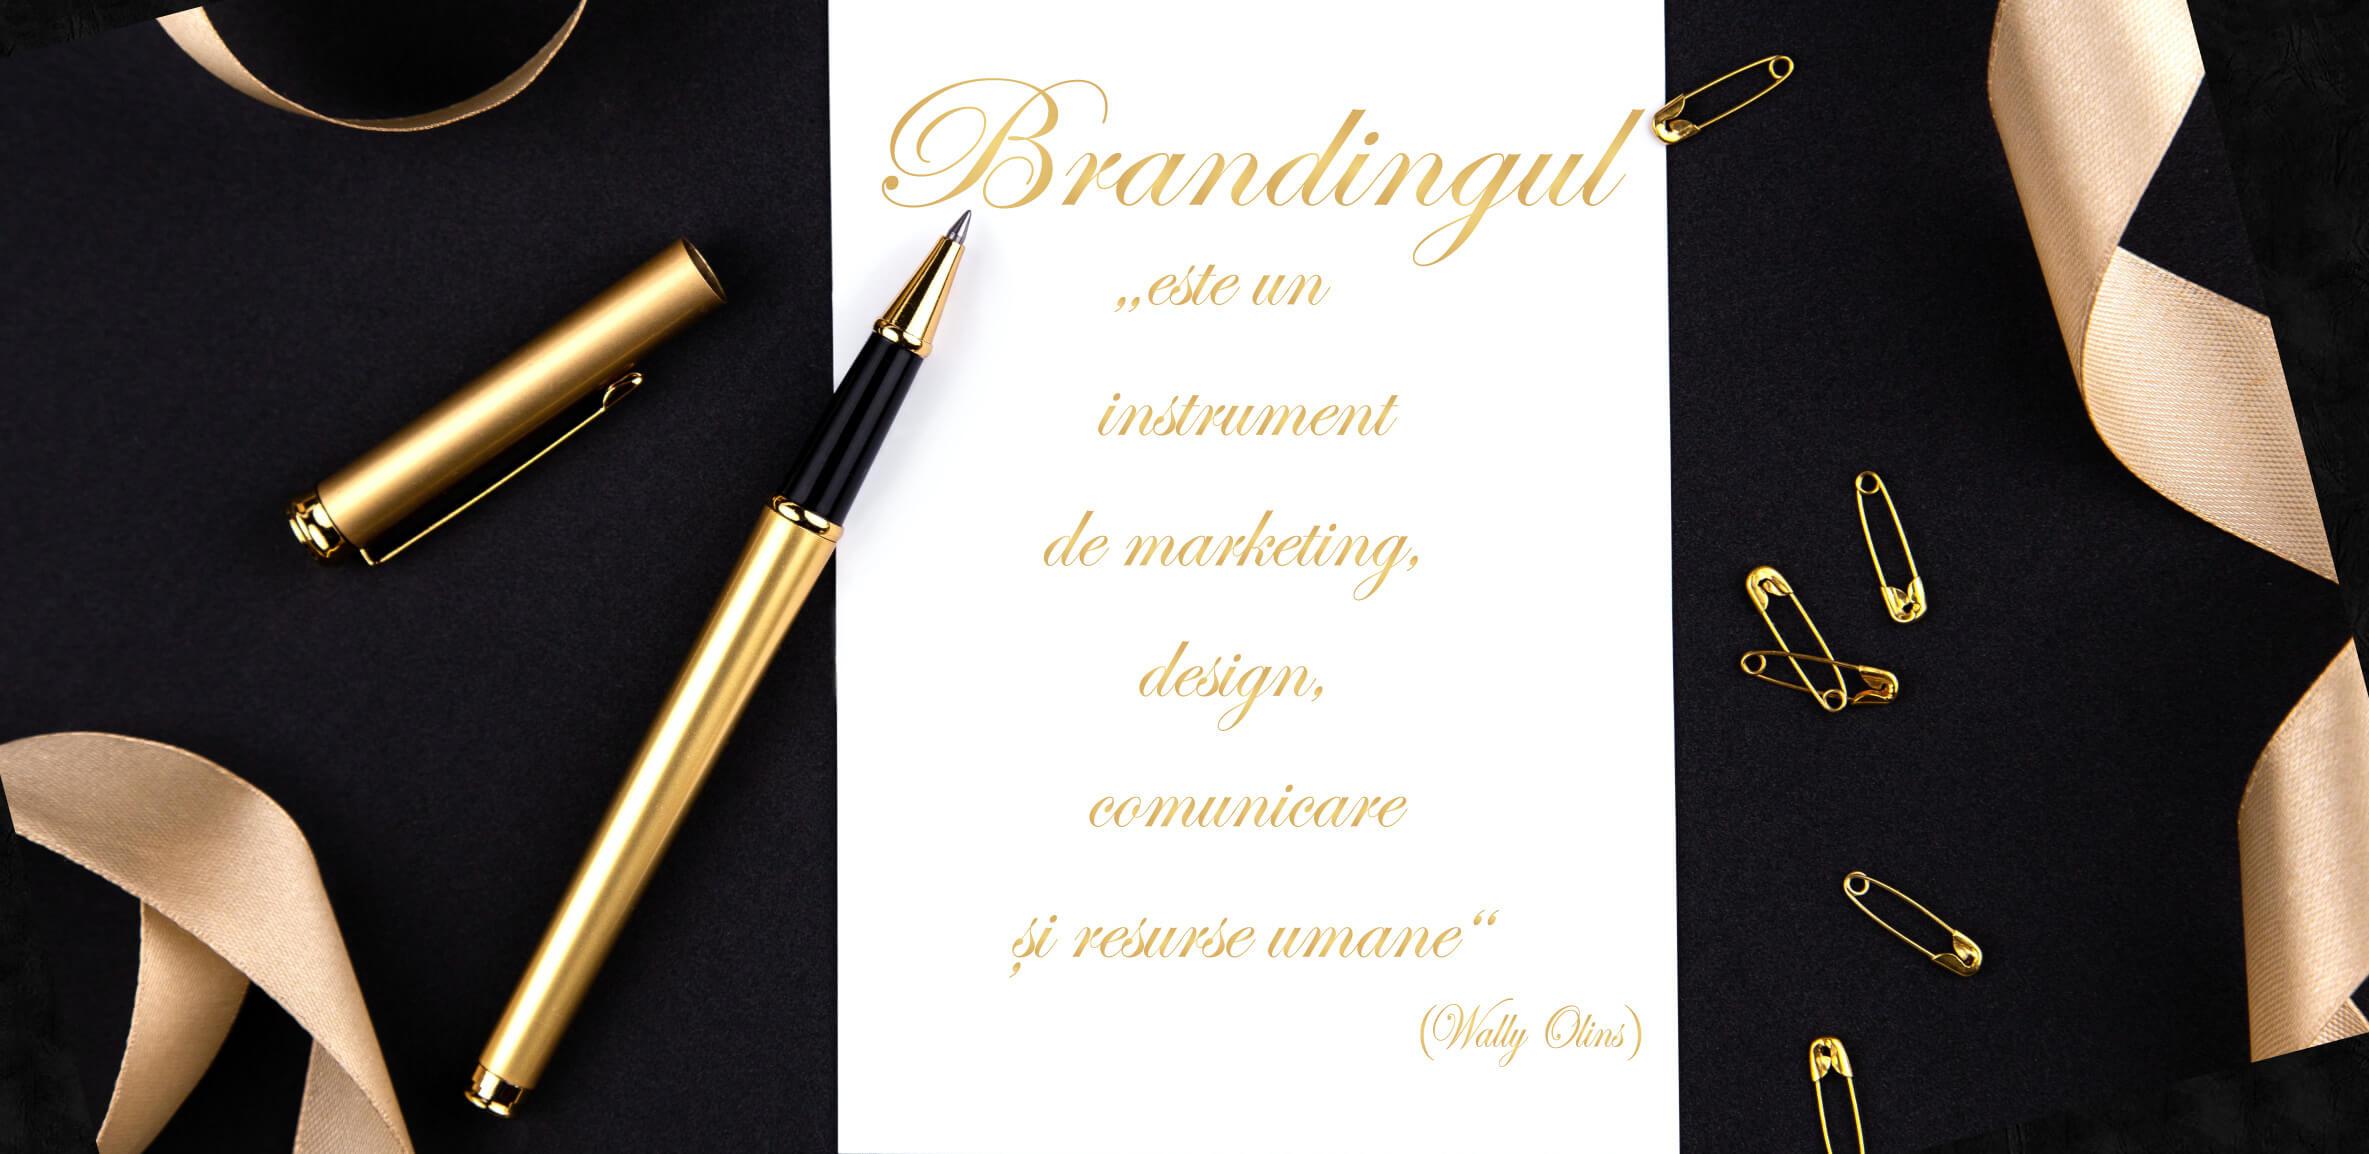 Branding pentru companii, Branding de produs